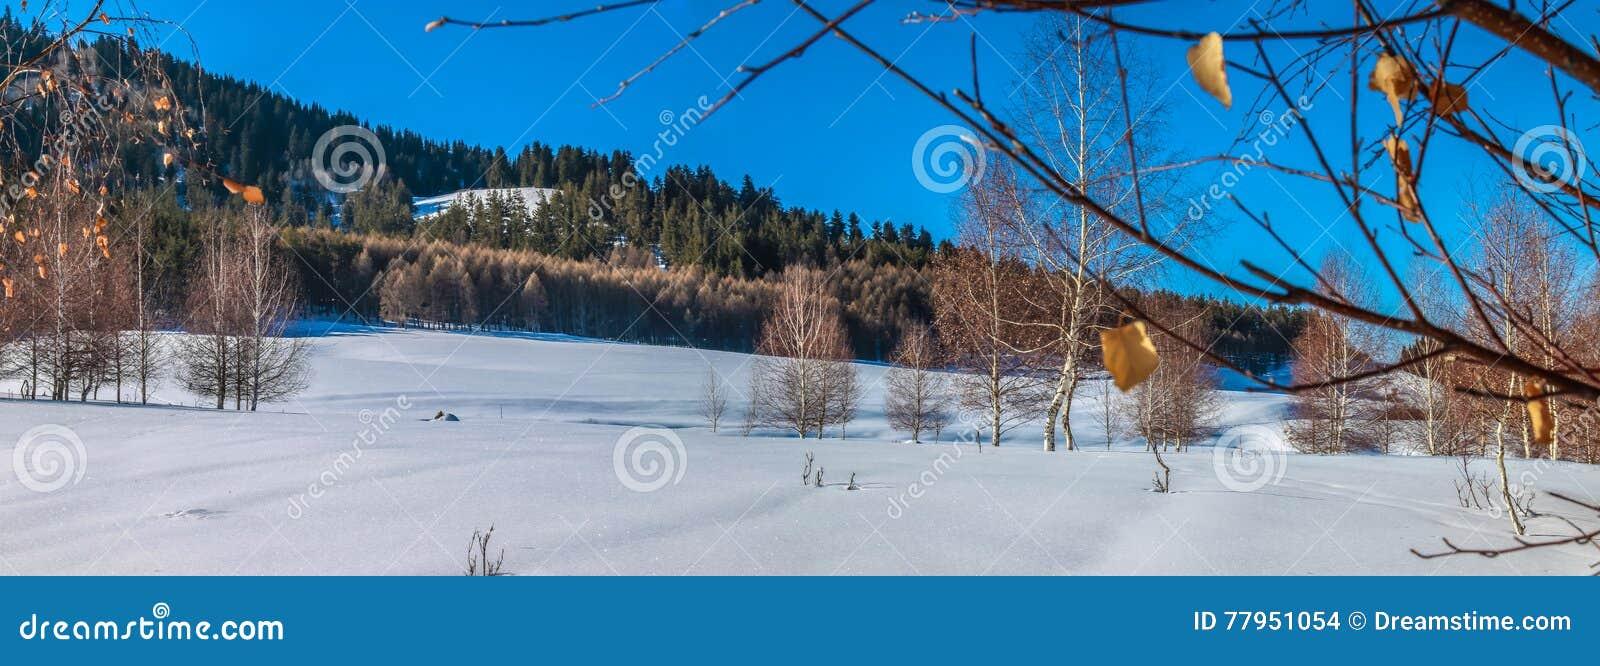 Winterwaldung